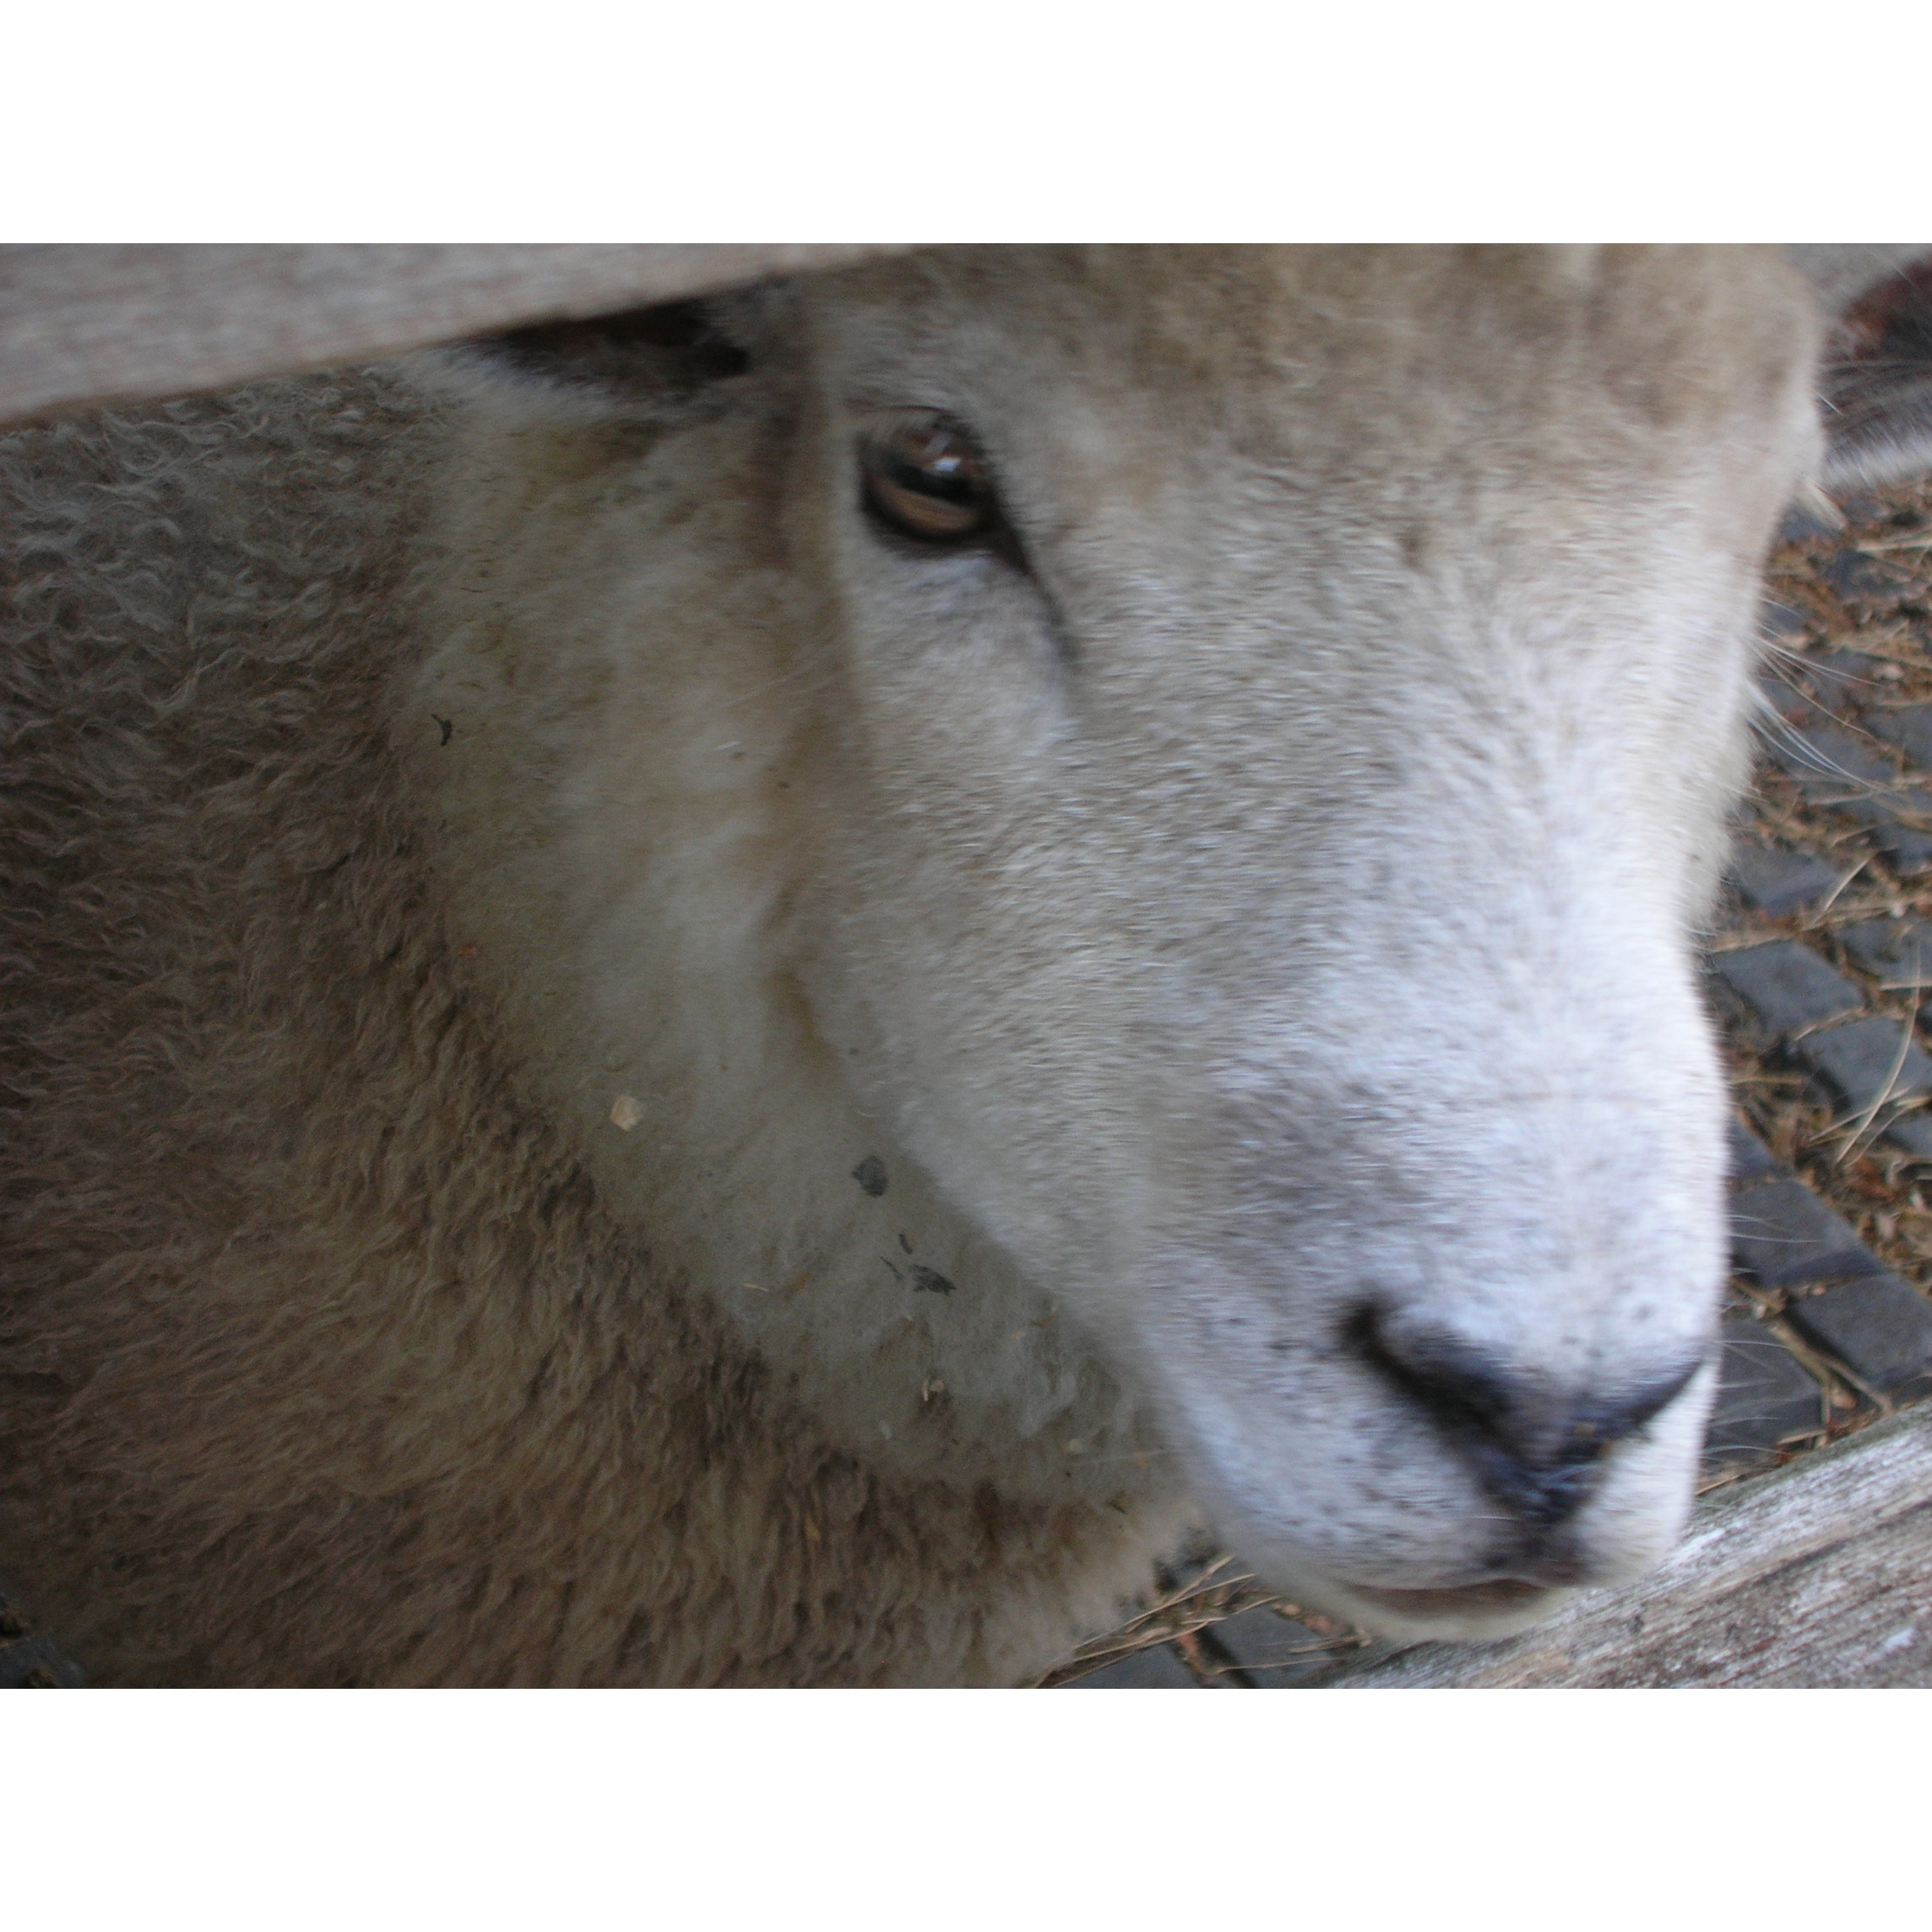 Sheep Ahoy Sheep Rescue